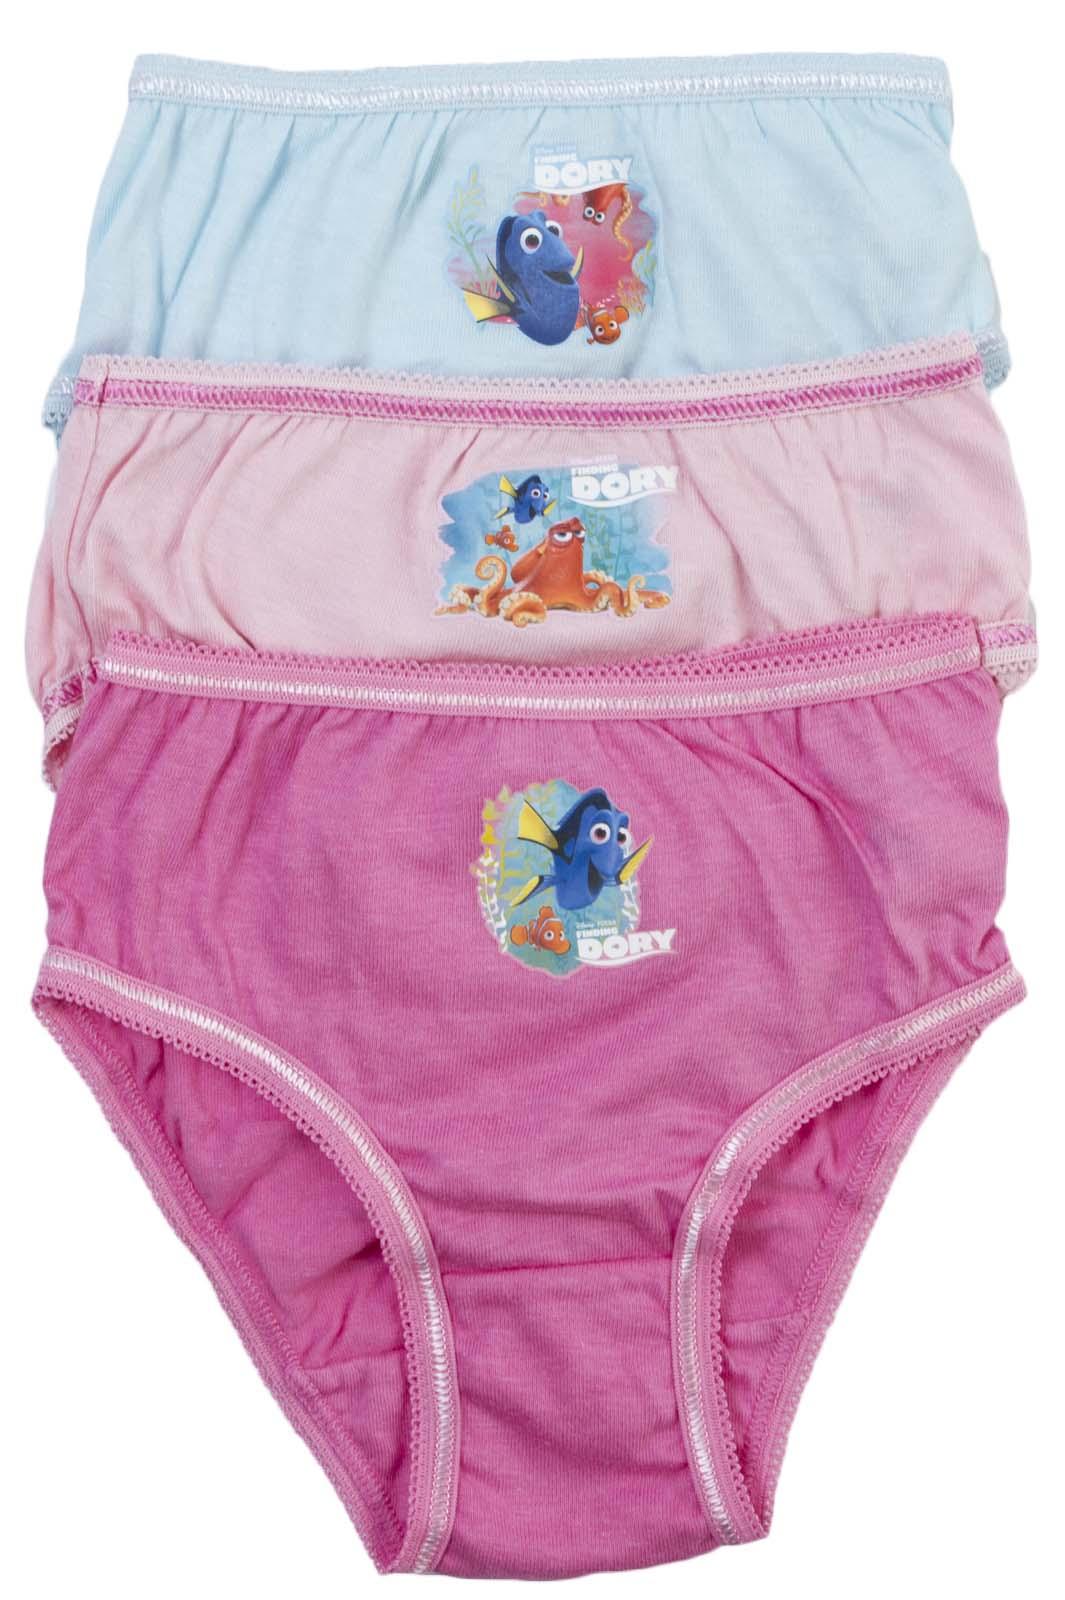 8db076f9cc2b 3 Pairs Girls Character Underwear 100% Cotton Knickers Briefs ...